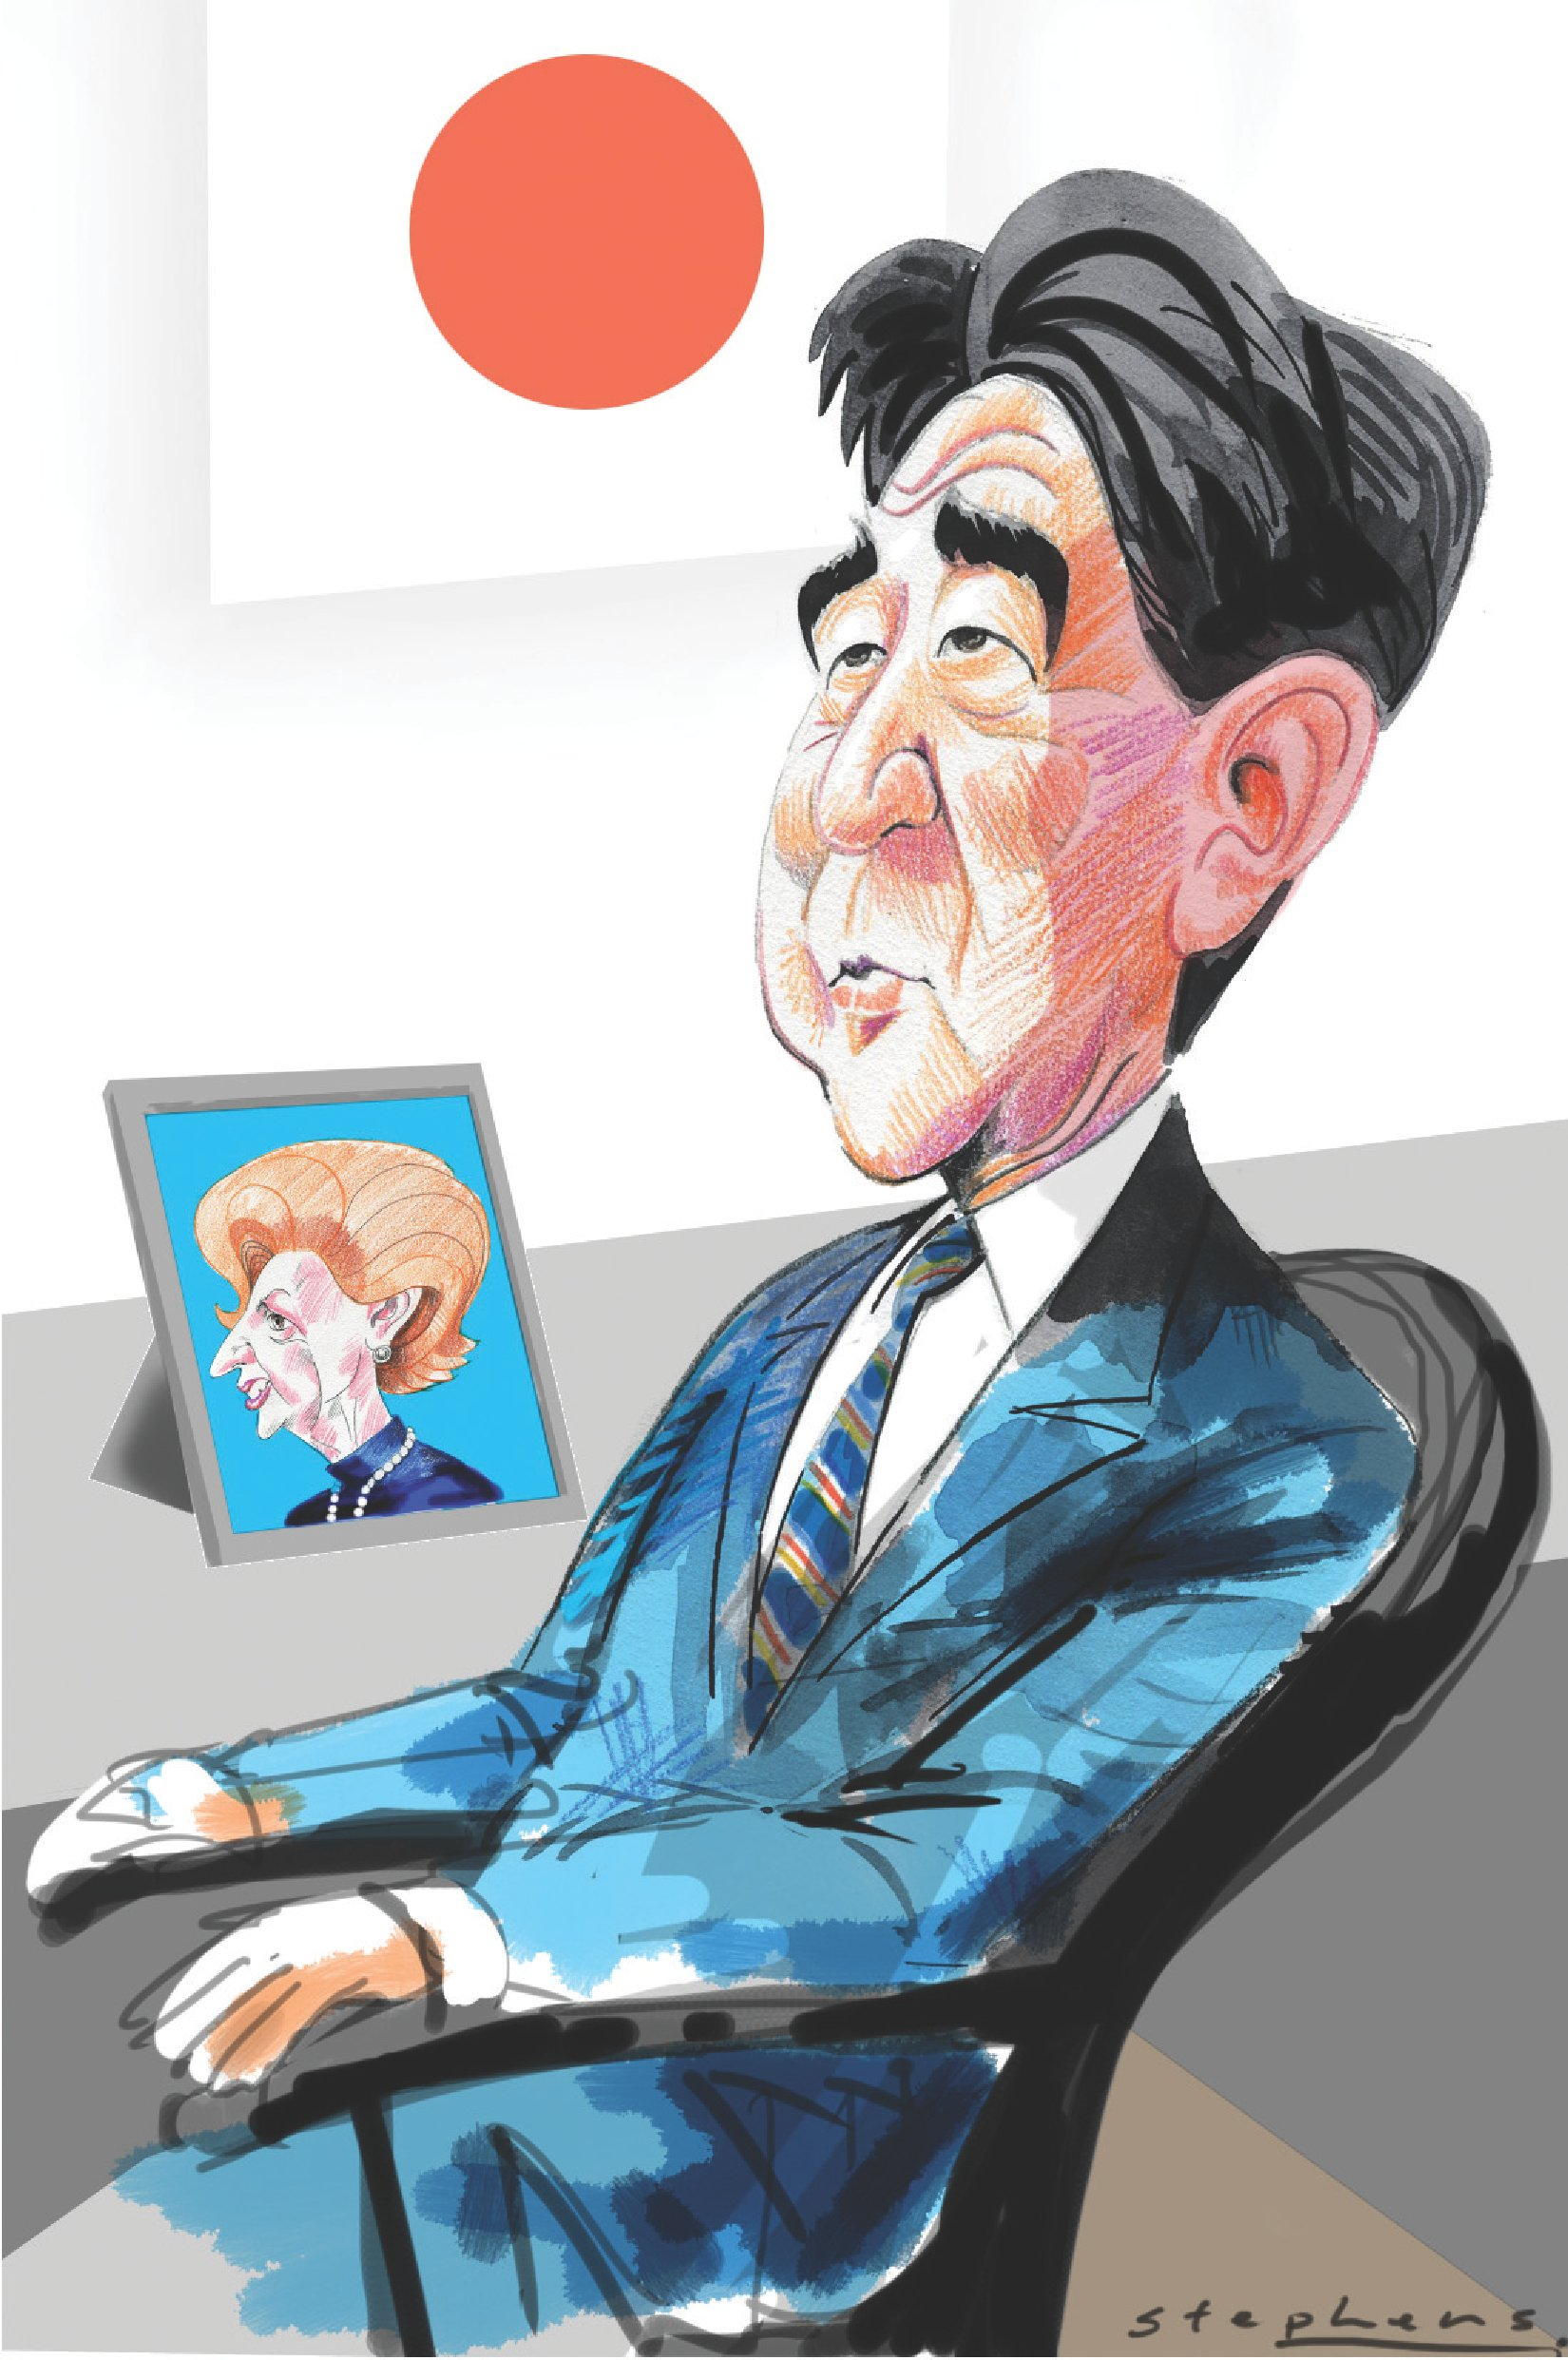 shinzo abe set to reshape japan with conservative agenda